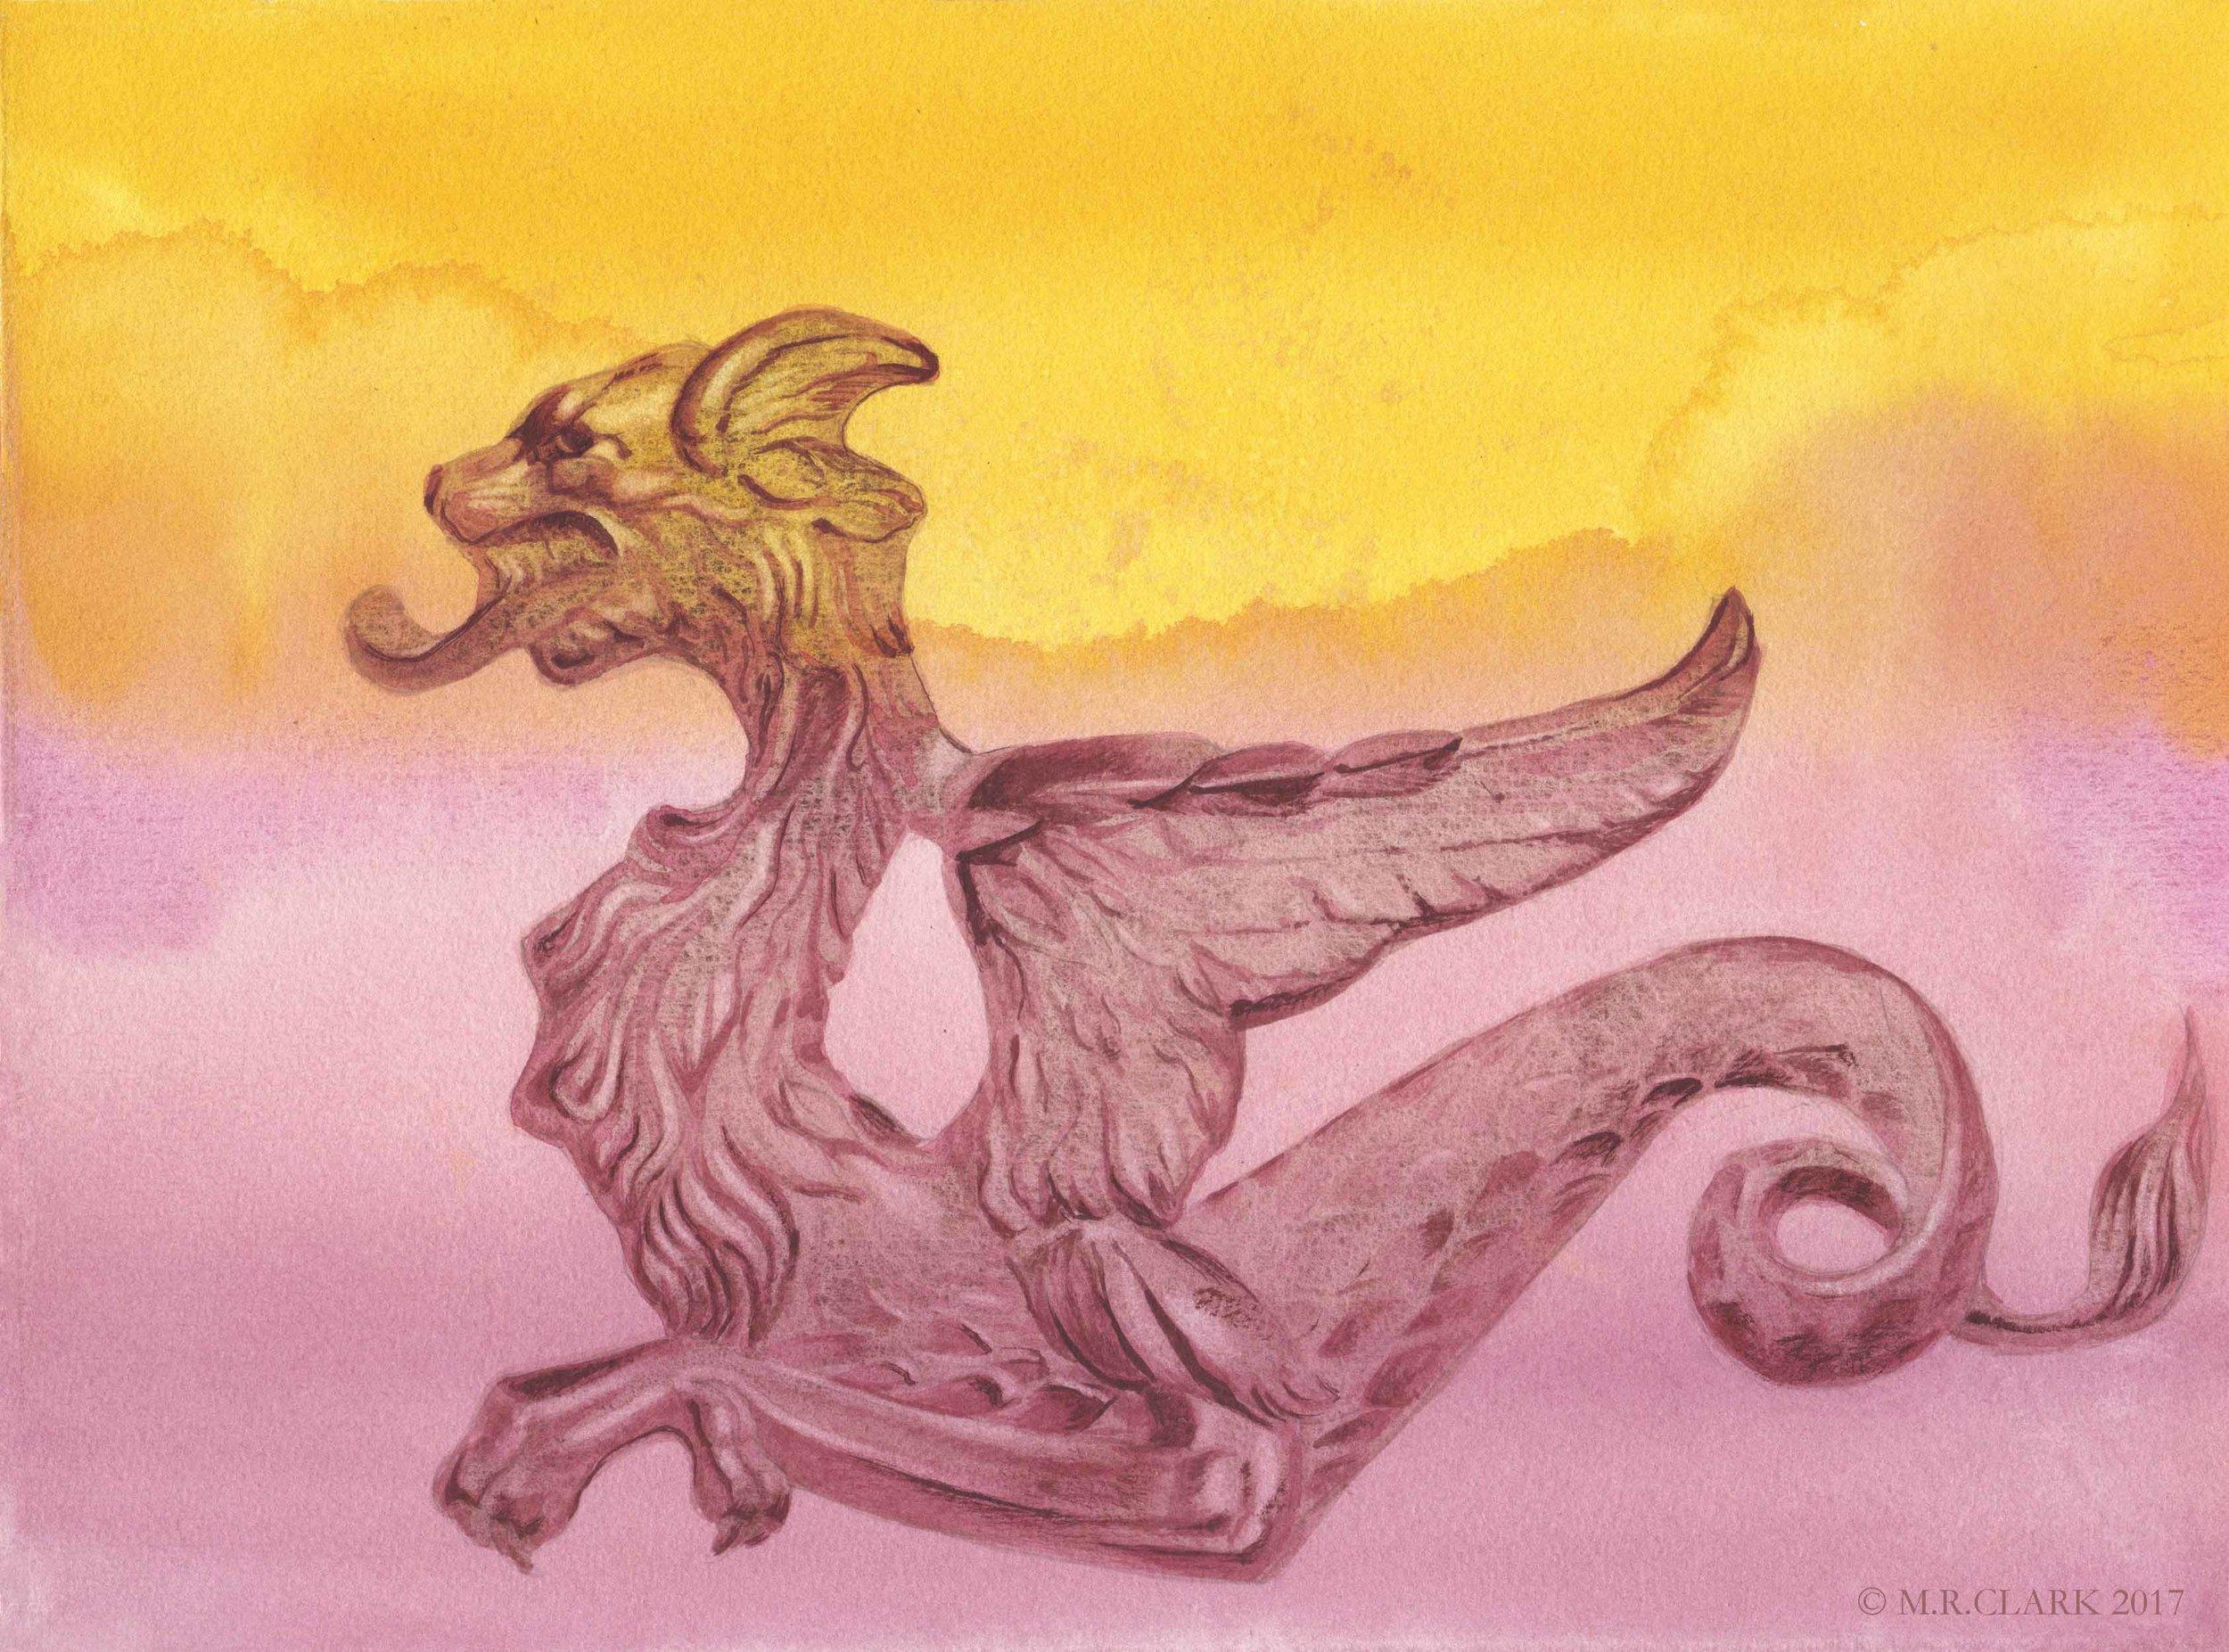 dragon No 1 web. watermark.jpg